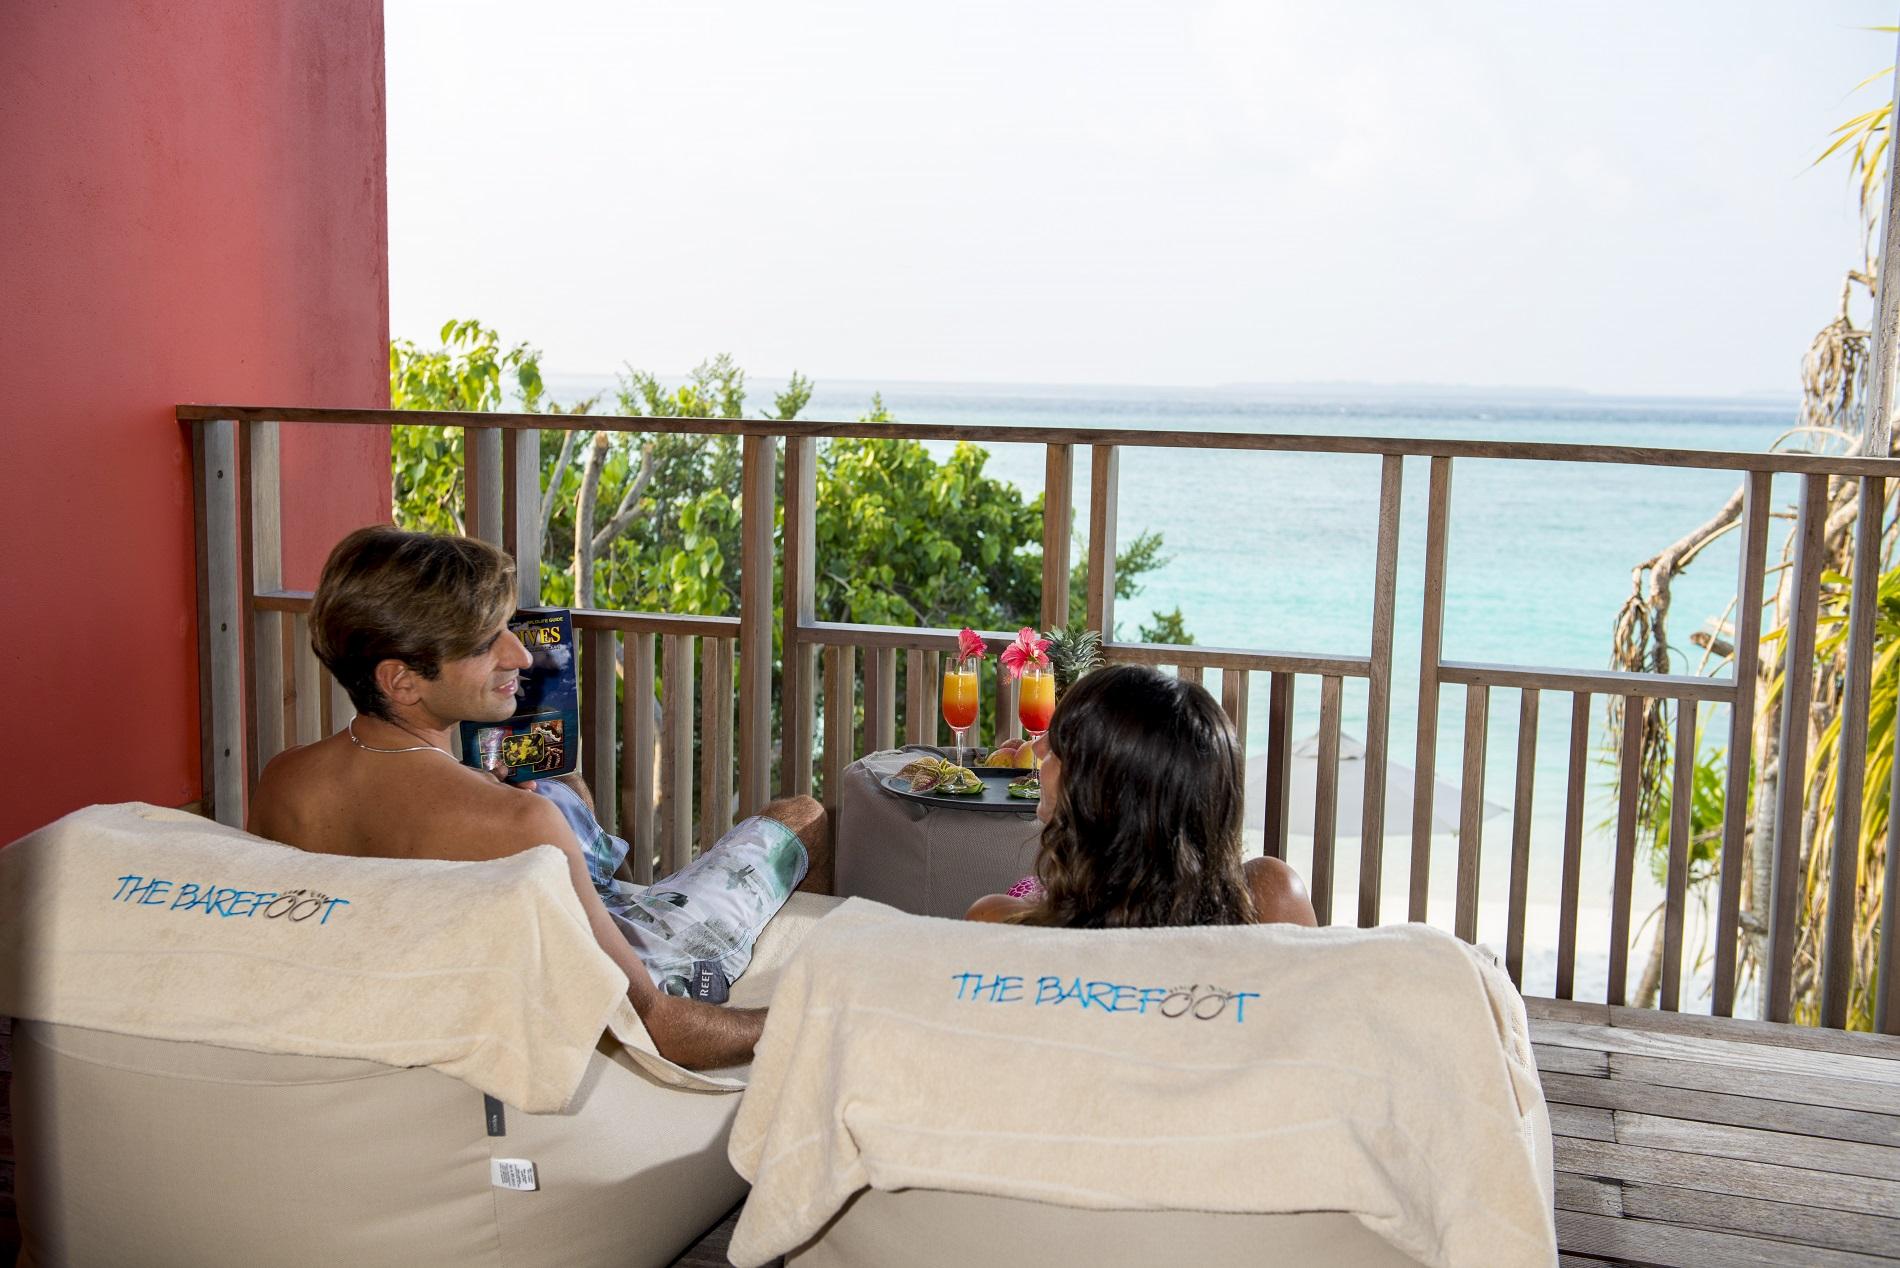 Barefoot_Resort-Maldive-Ocean-Terrazza-Wadi_Destination.jpg